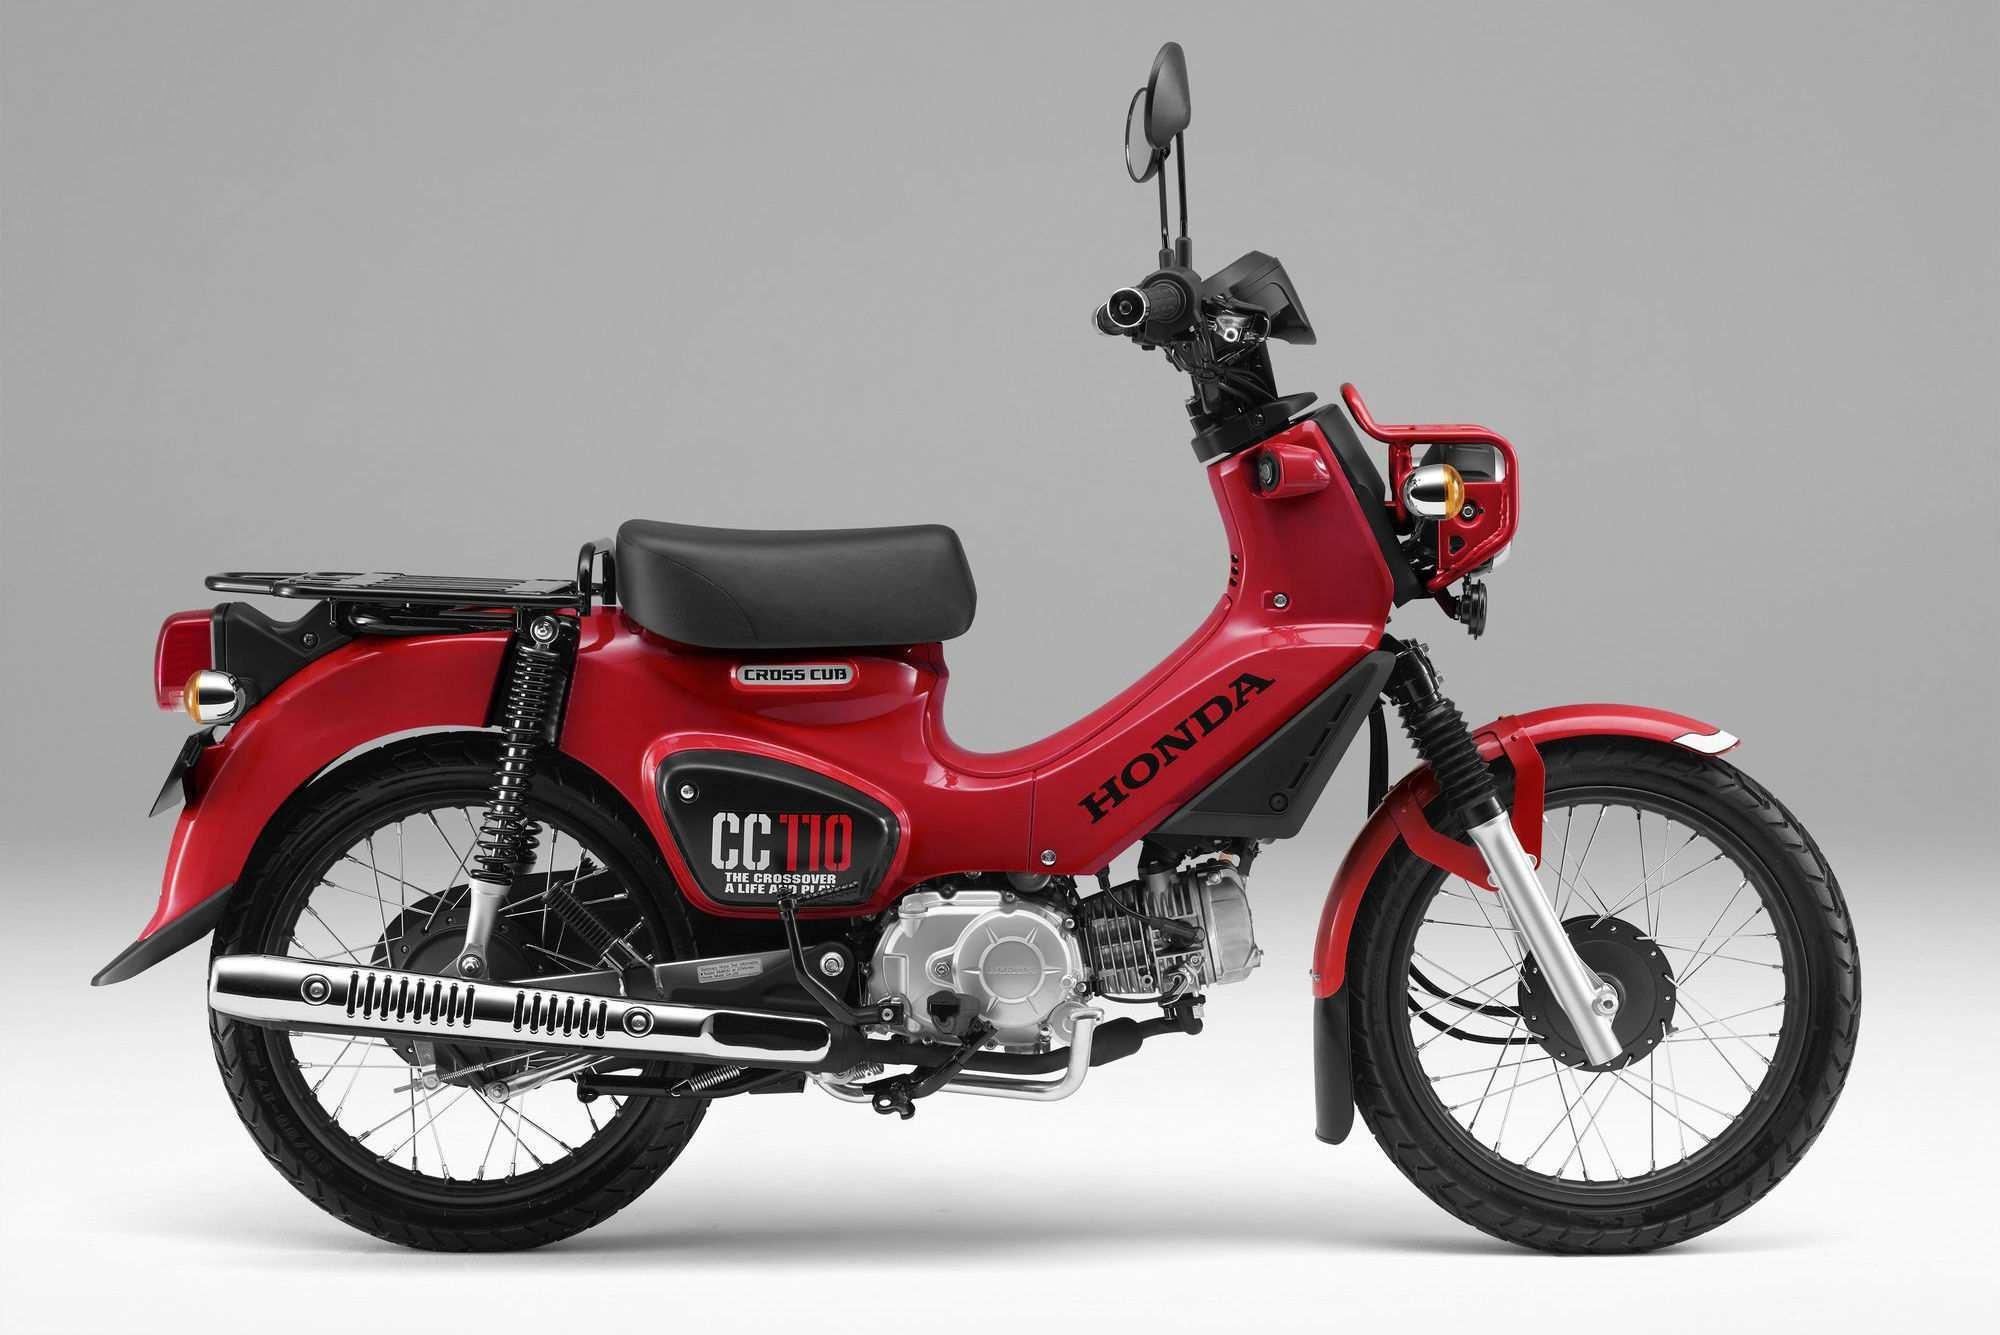 67 Gallery of 2019 Honda 125 Cub Pricing for 2019 Honda 125 Cub